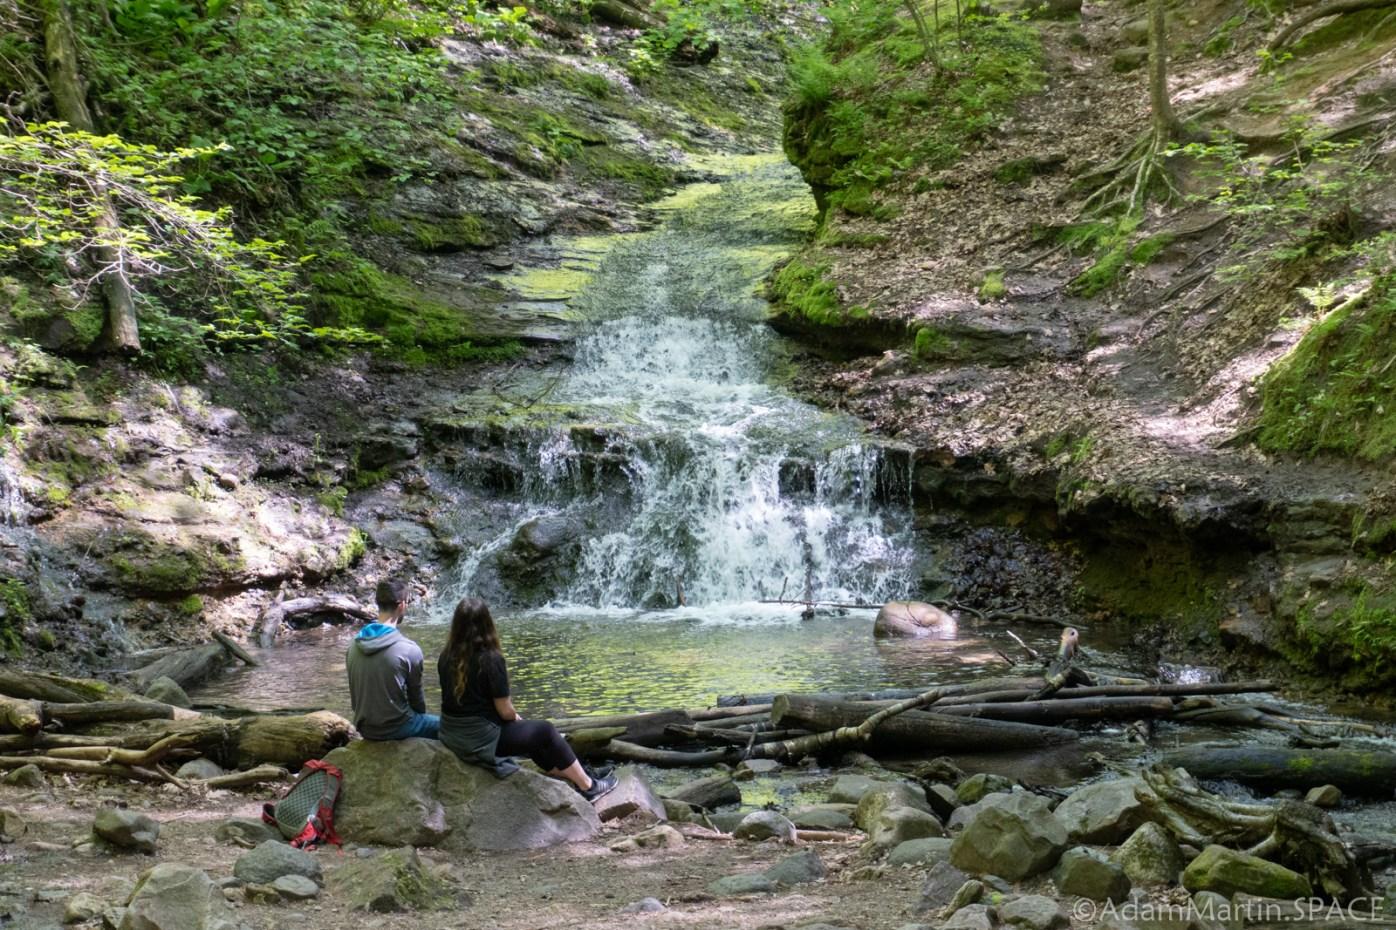 Parfreys Glen State Natural Area - Parfreys Glen Falls